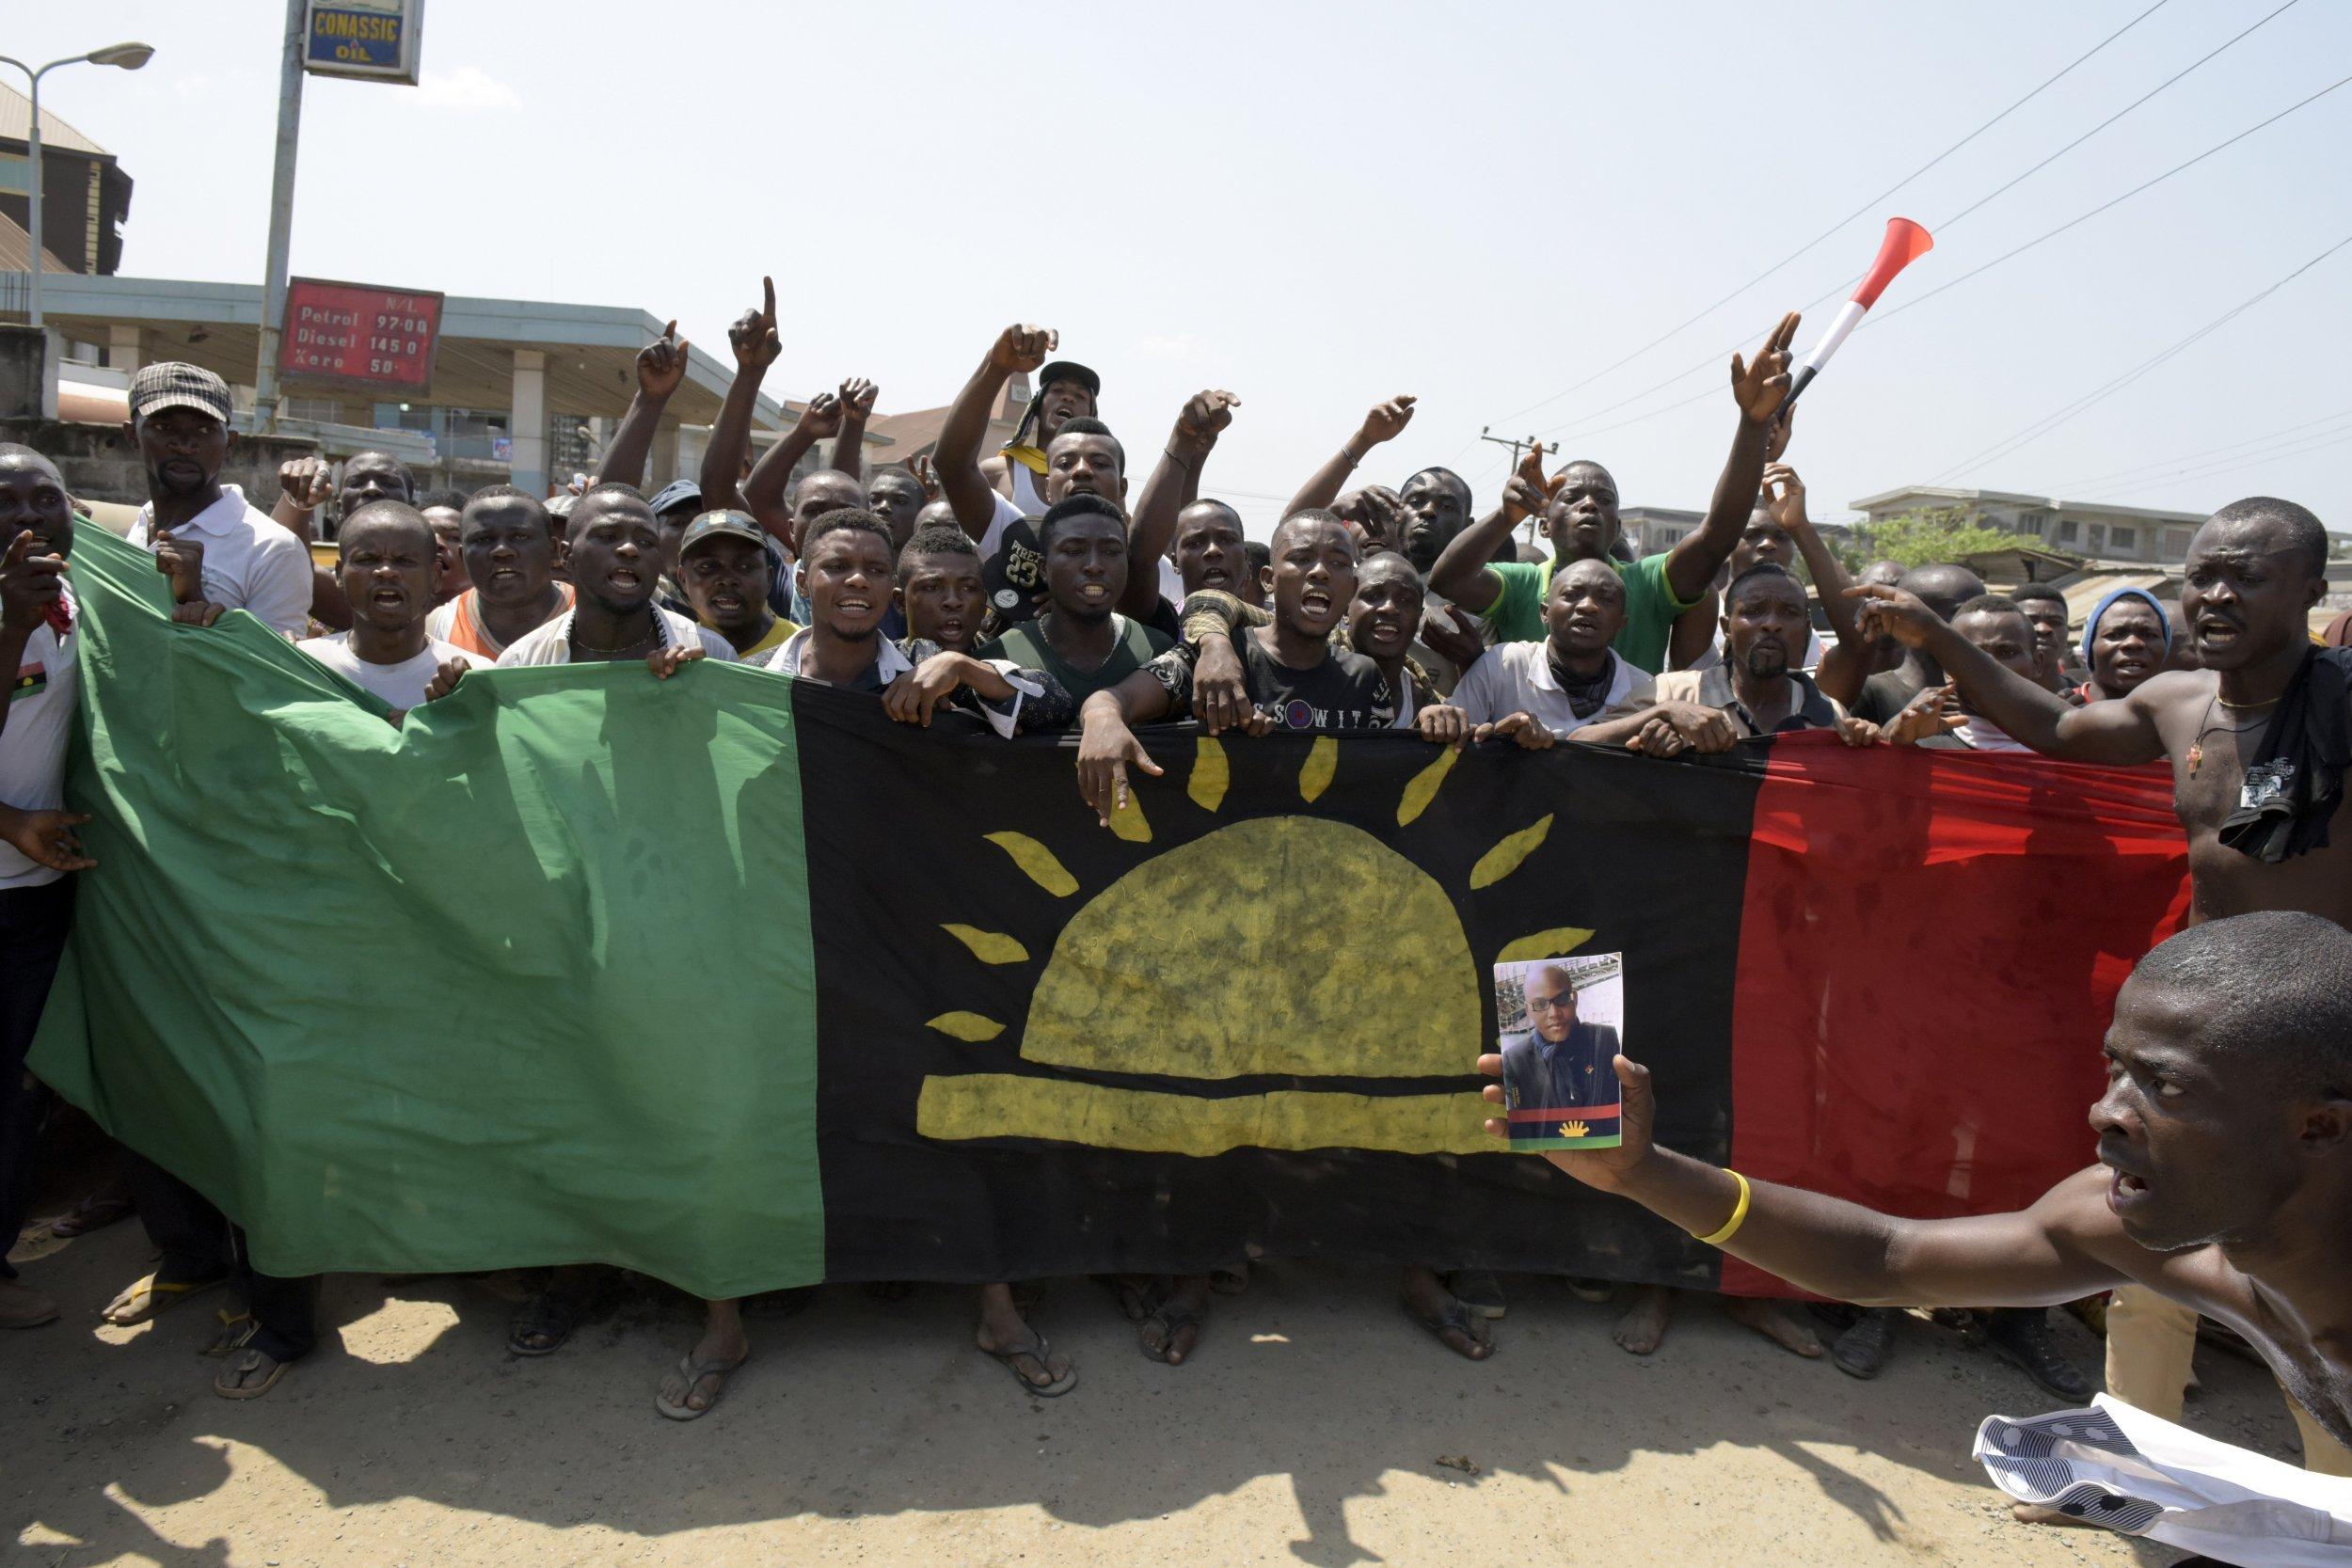 Biafran protesters demonstrate in Aba, Nigeria.